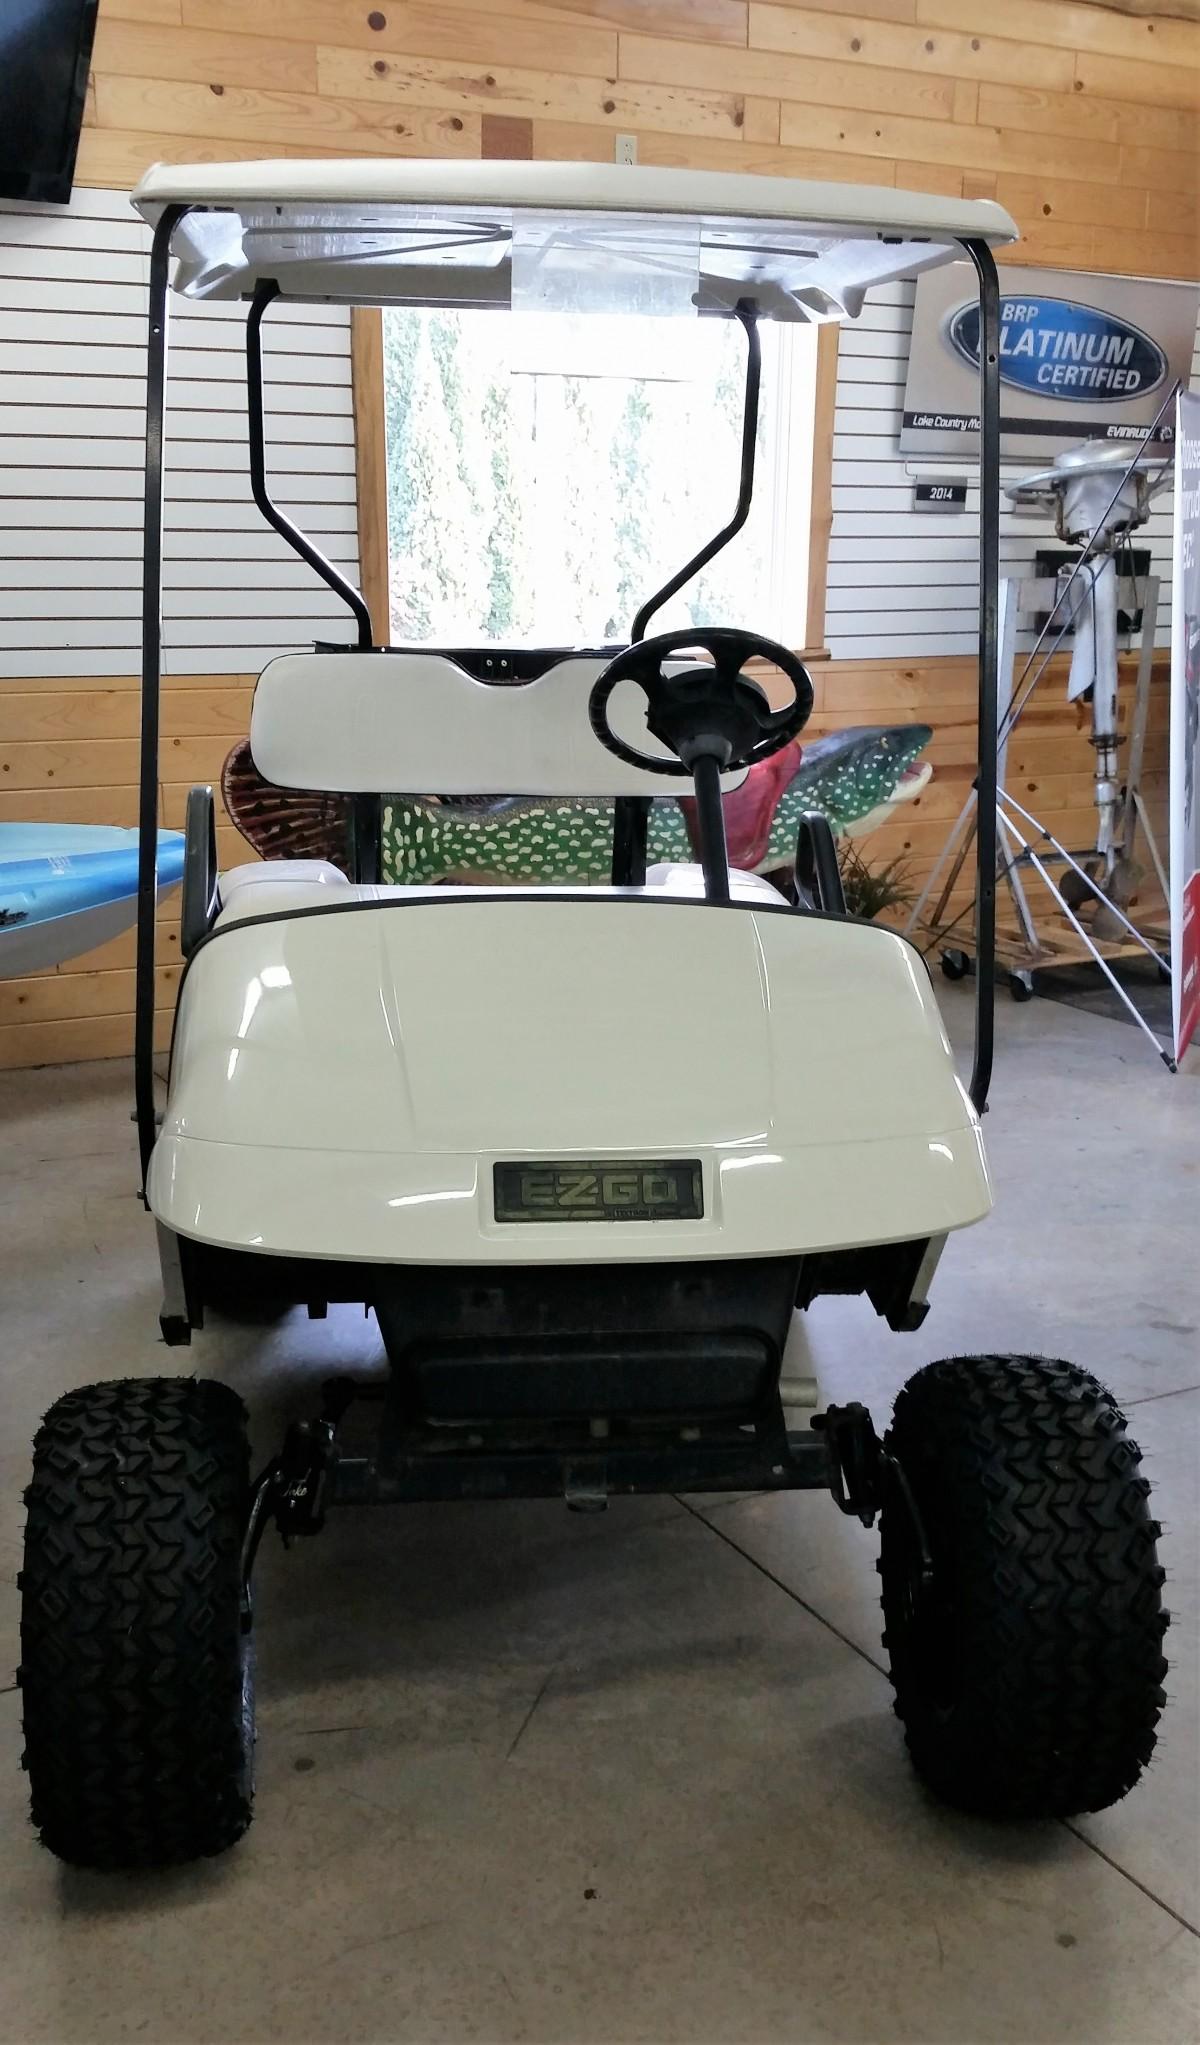 EZ GO Golf Cart 2004 - Golf Carts